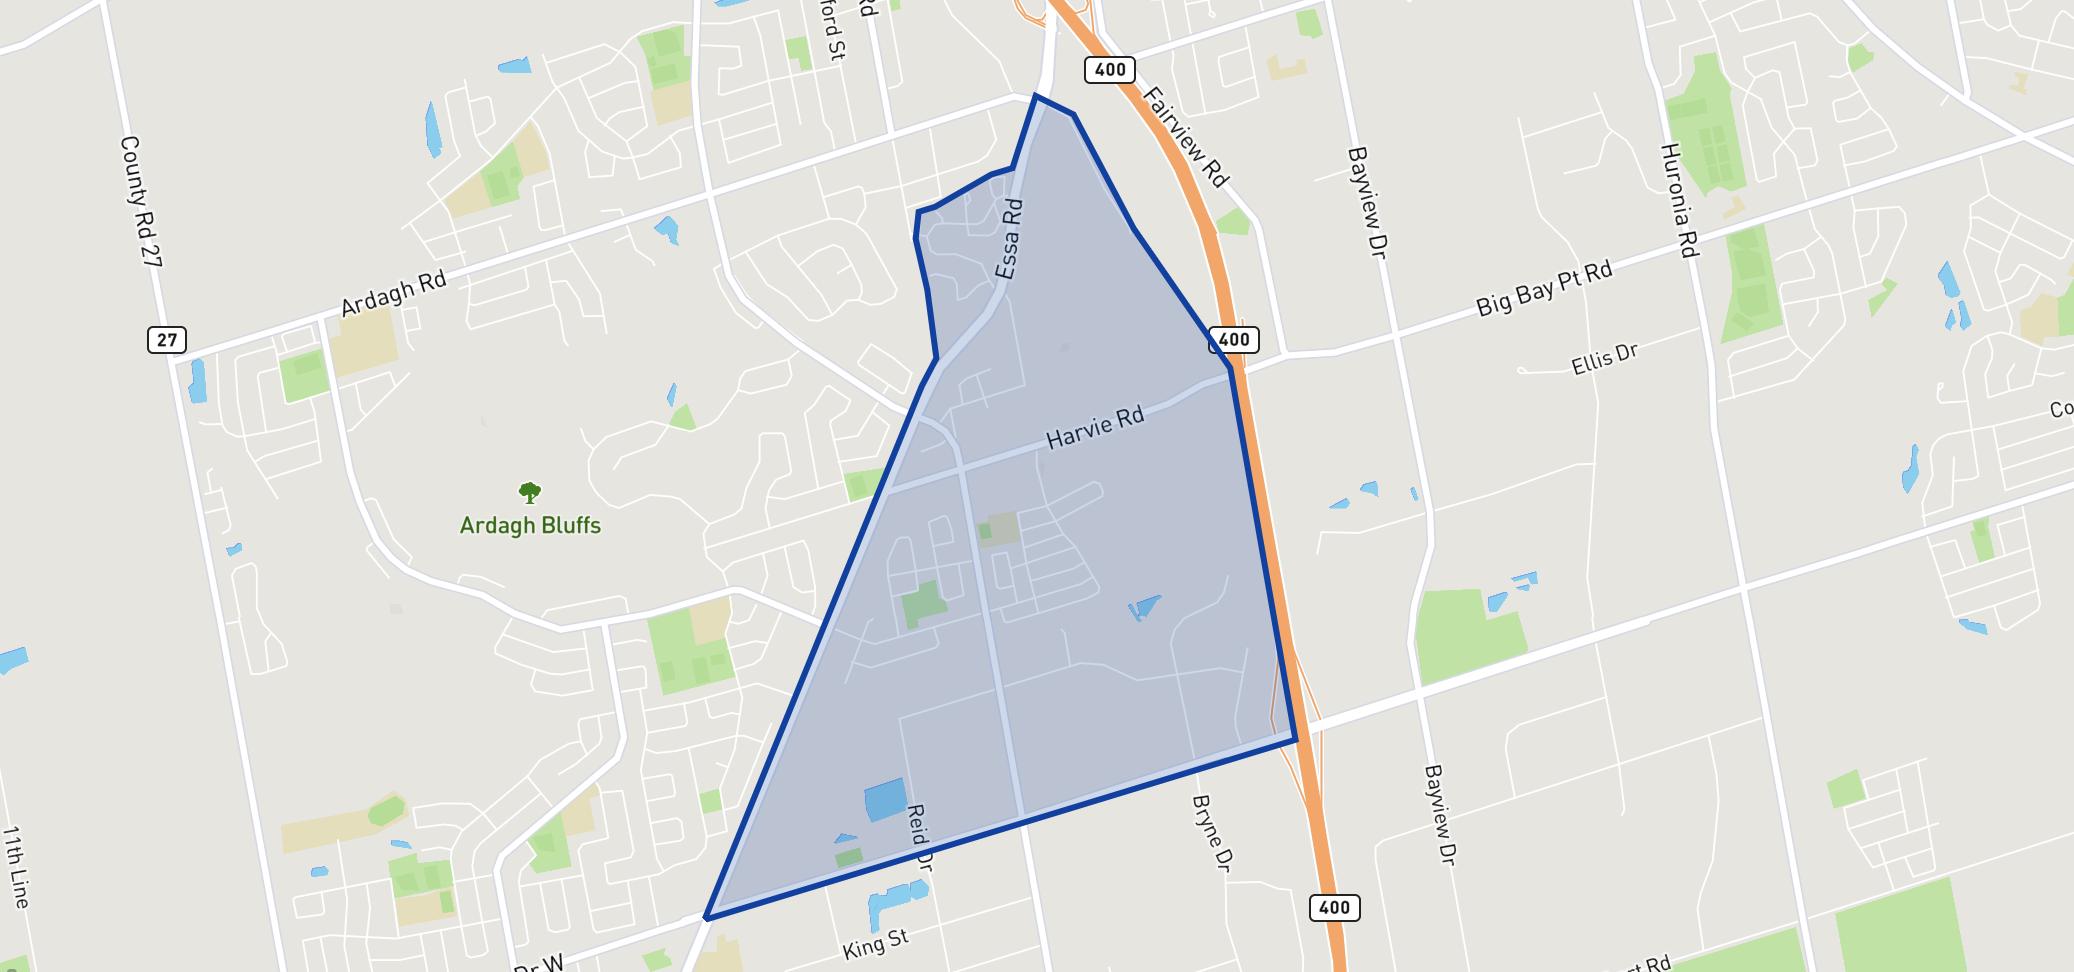 Trillium Woods Elementary School neighbourhood borders